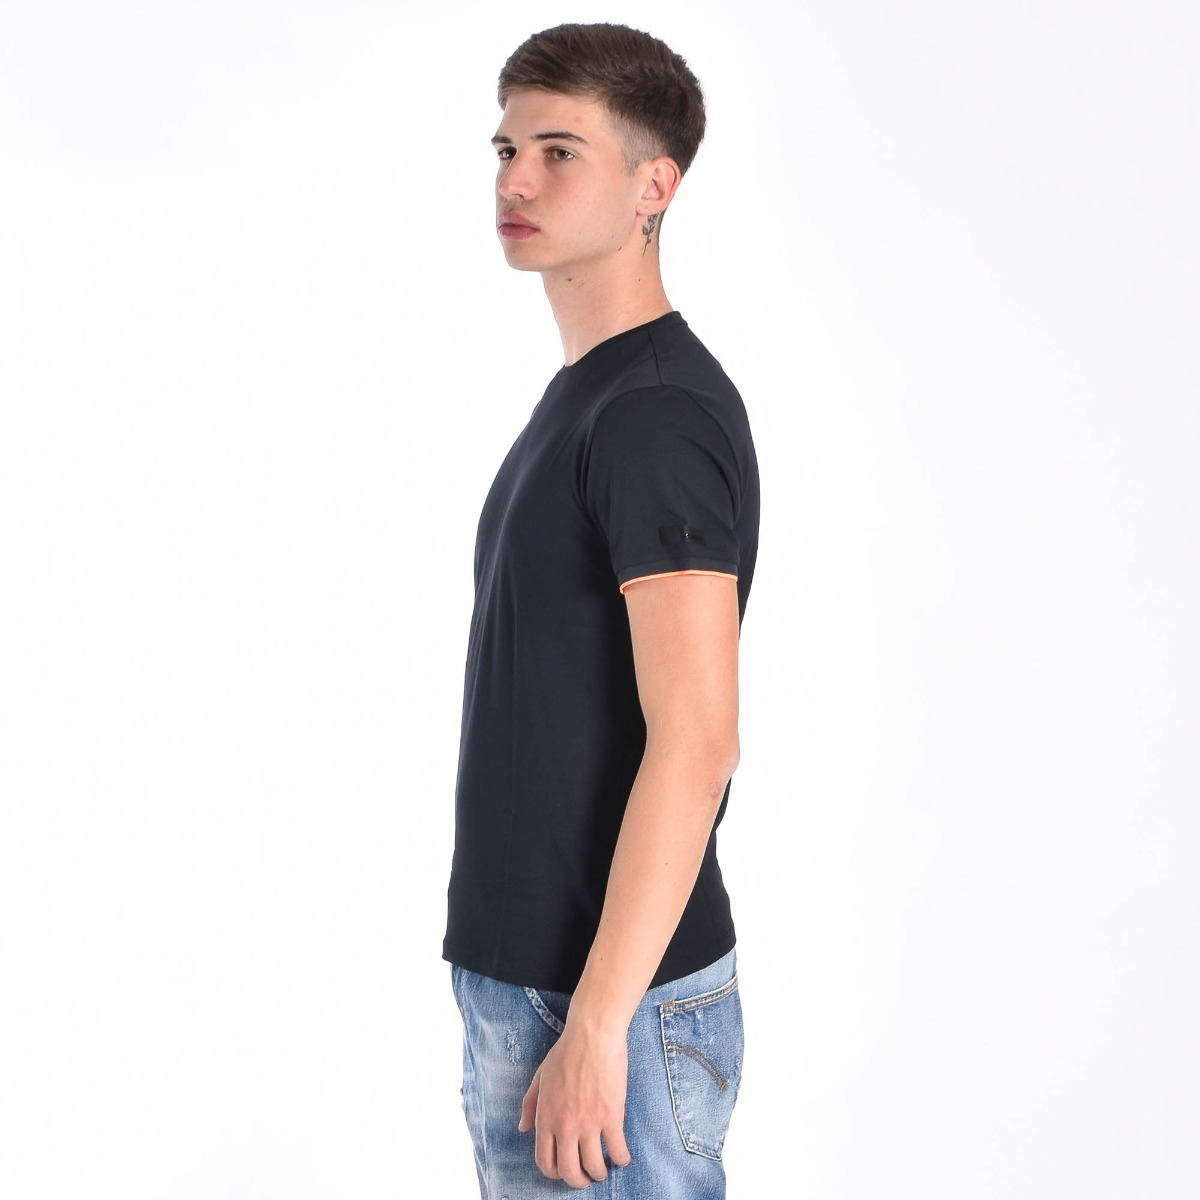 T-shirt inserto fluo- Blu scuro